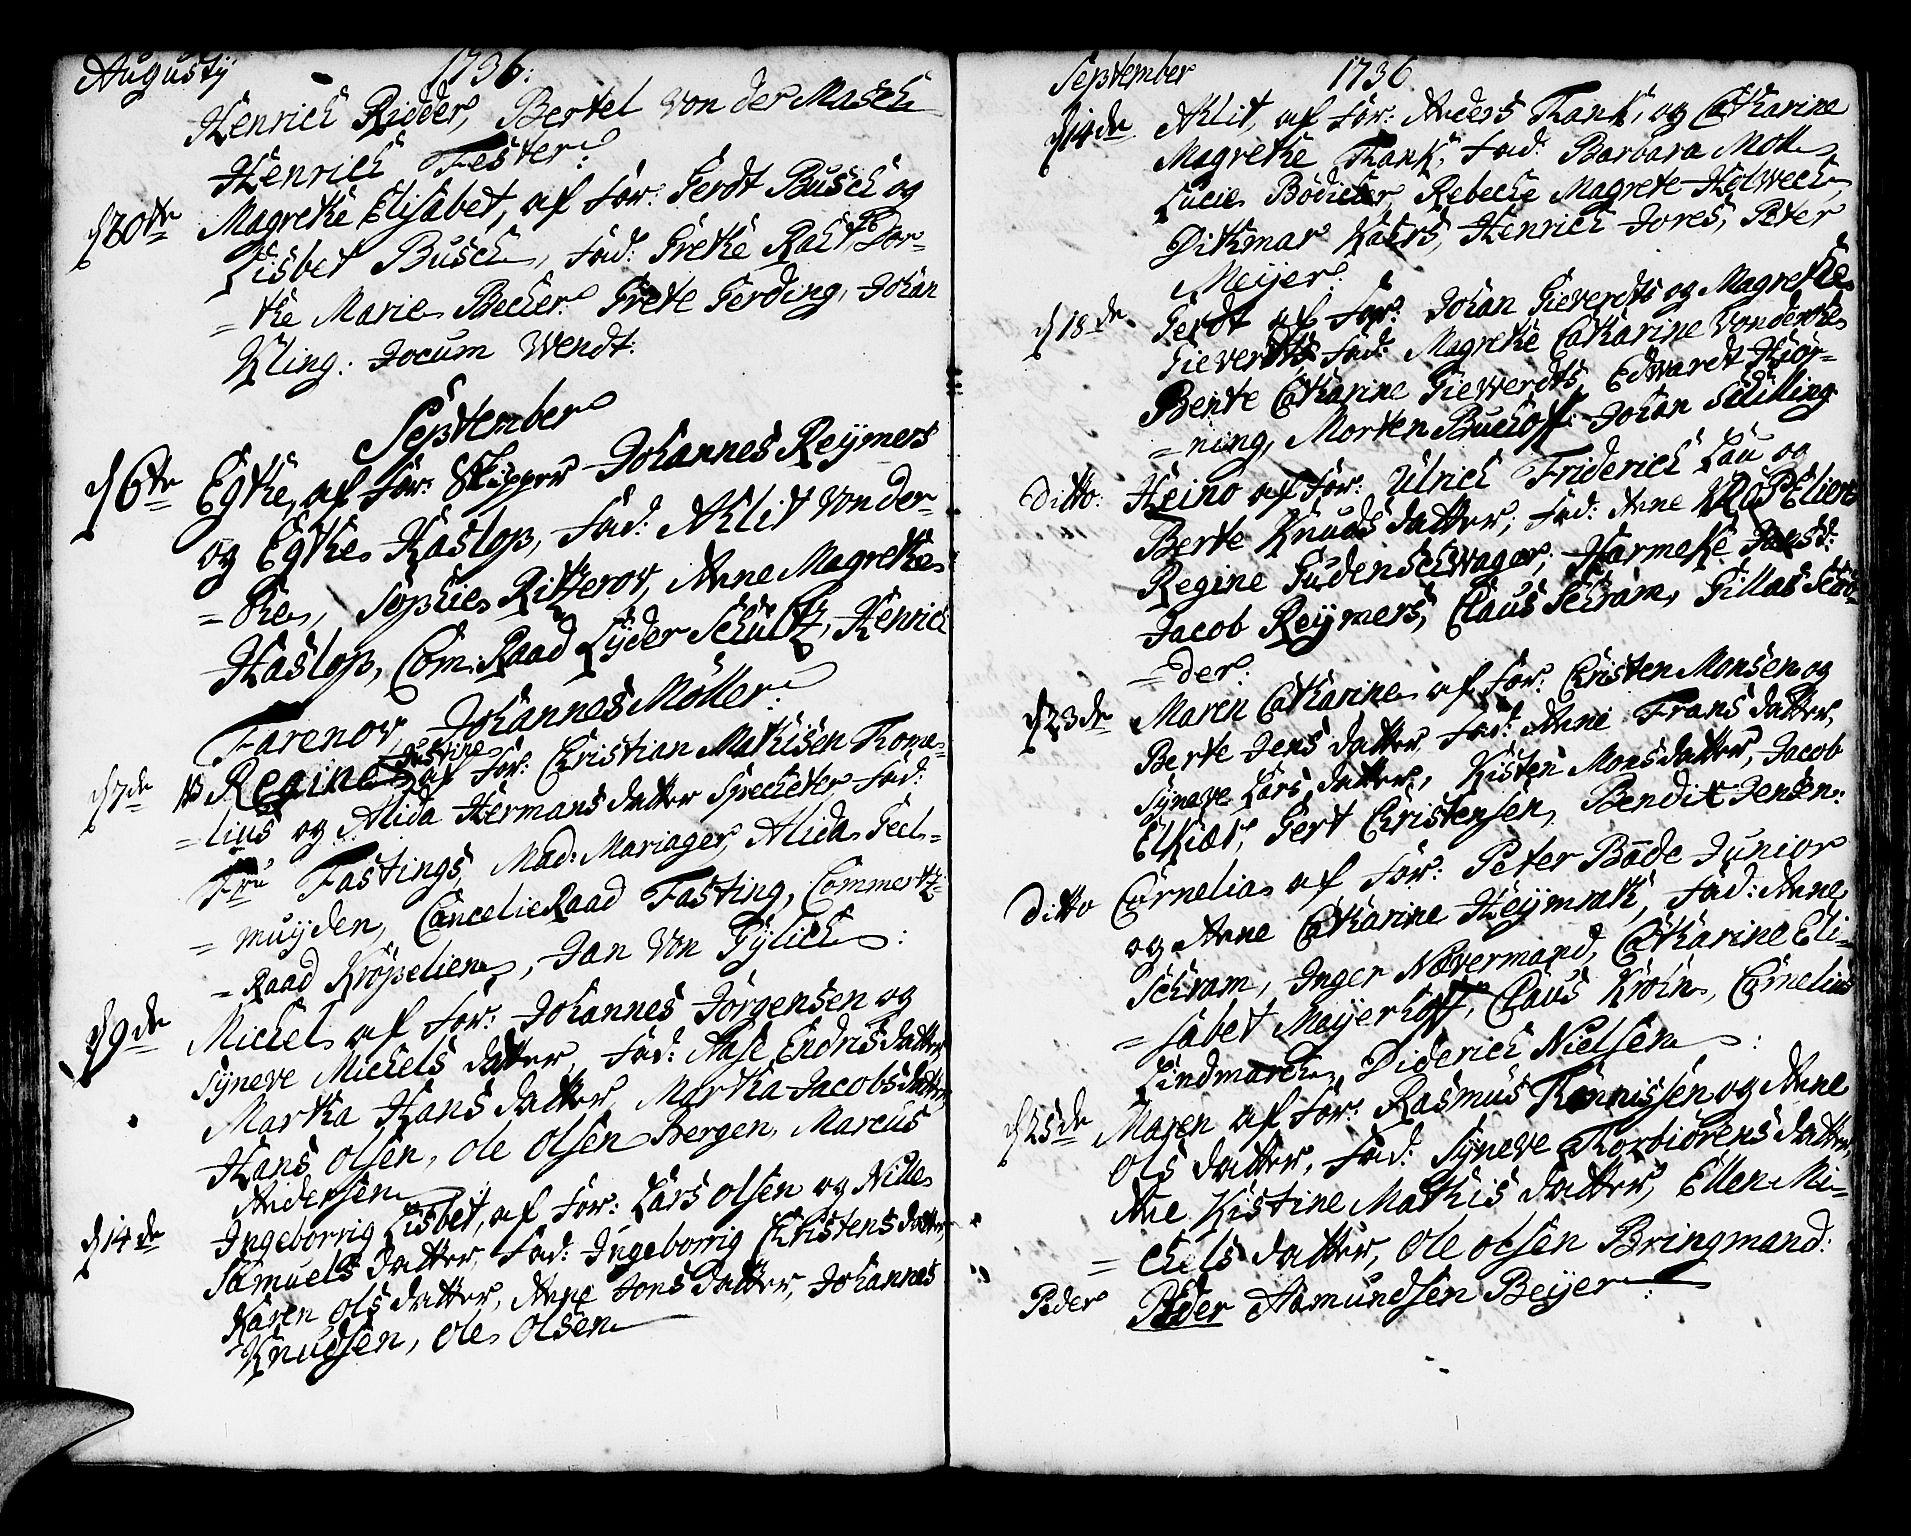 SAB, Korskirken Sokneprestembete, H/Haa/L0004: Ministerialbok nr. A 4, 1720-1750, s. 169